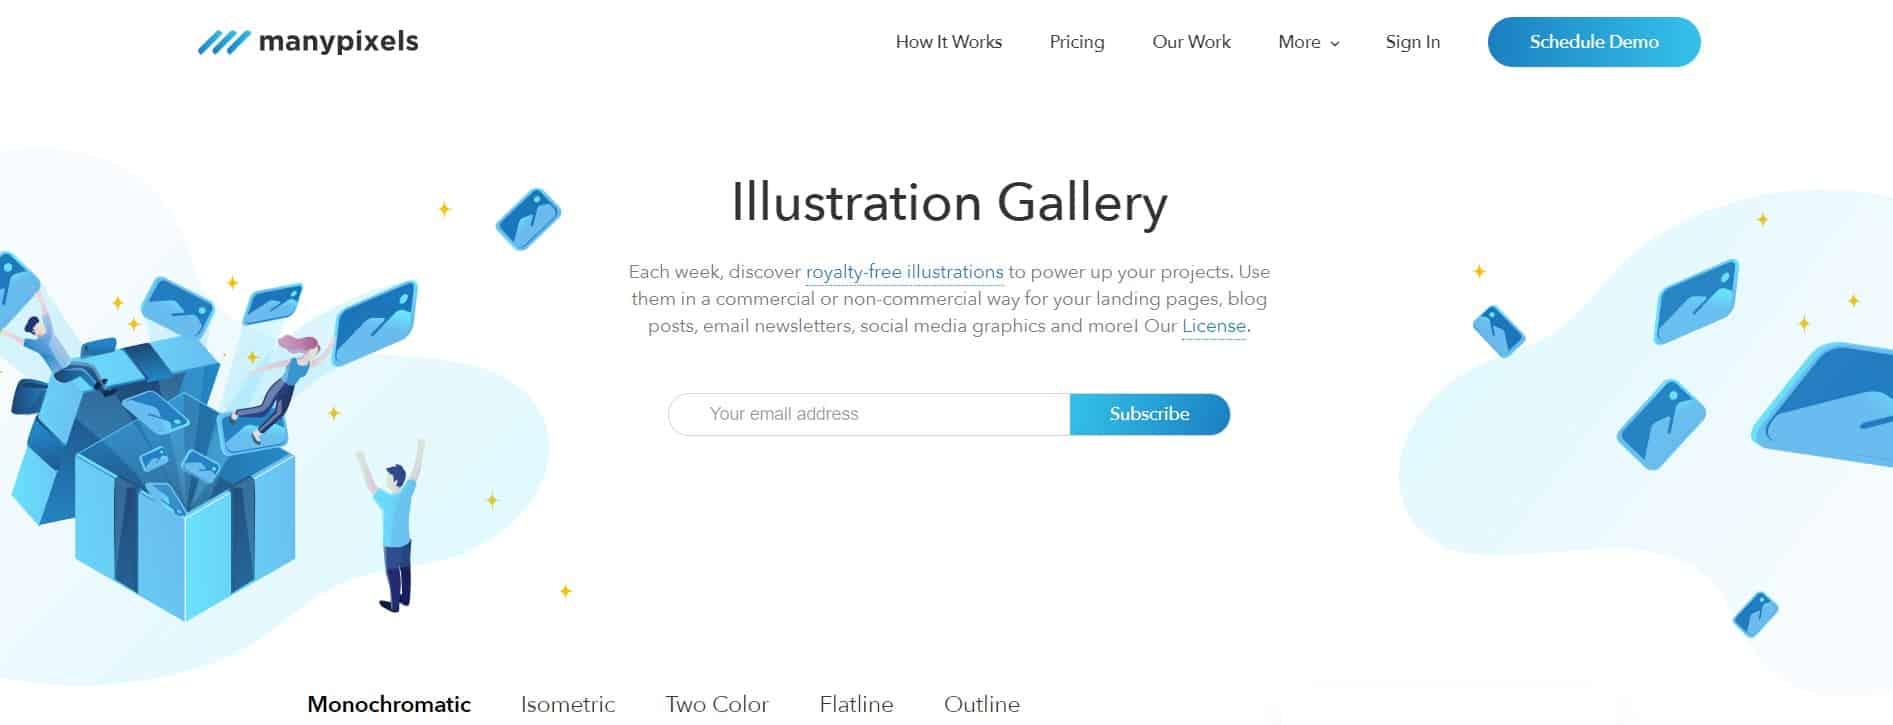 ManyPixels: Unlimited Graphic Design | Get Your Personal Designer